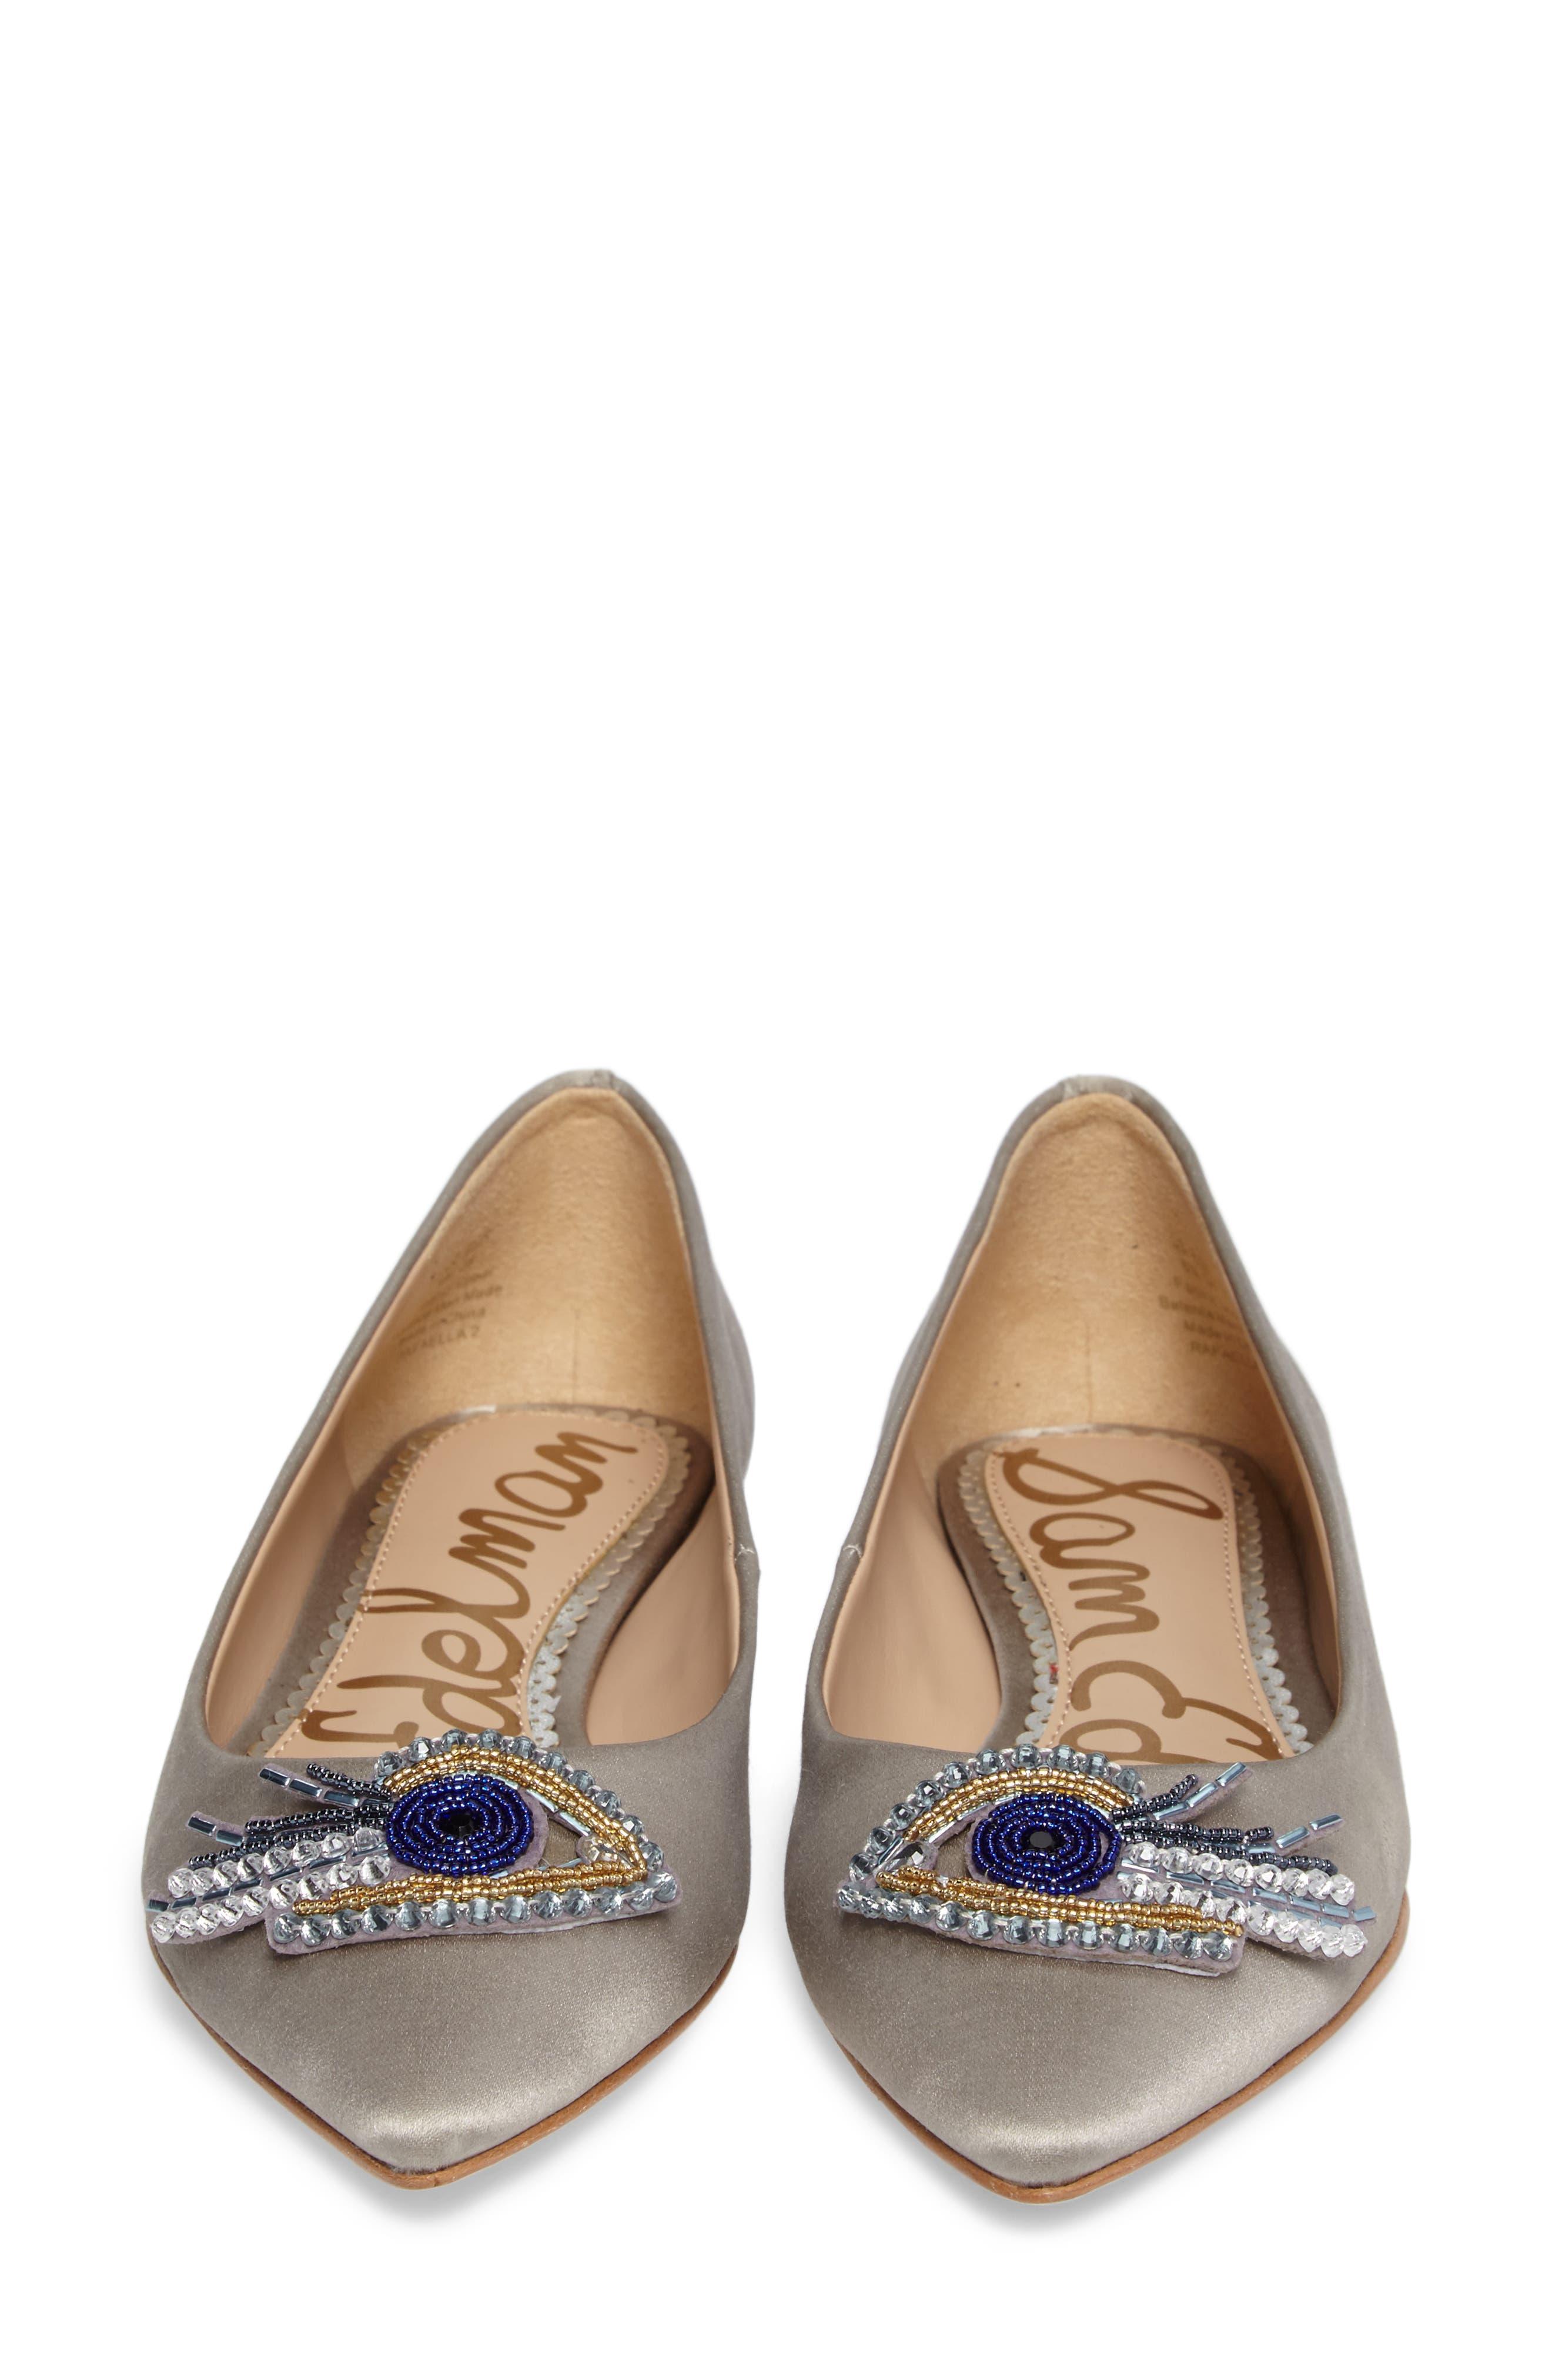 Rafaella Pointy Toe Ballet Flat,                             Alternate thumbnail 5, color,                             020